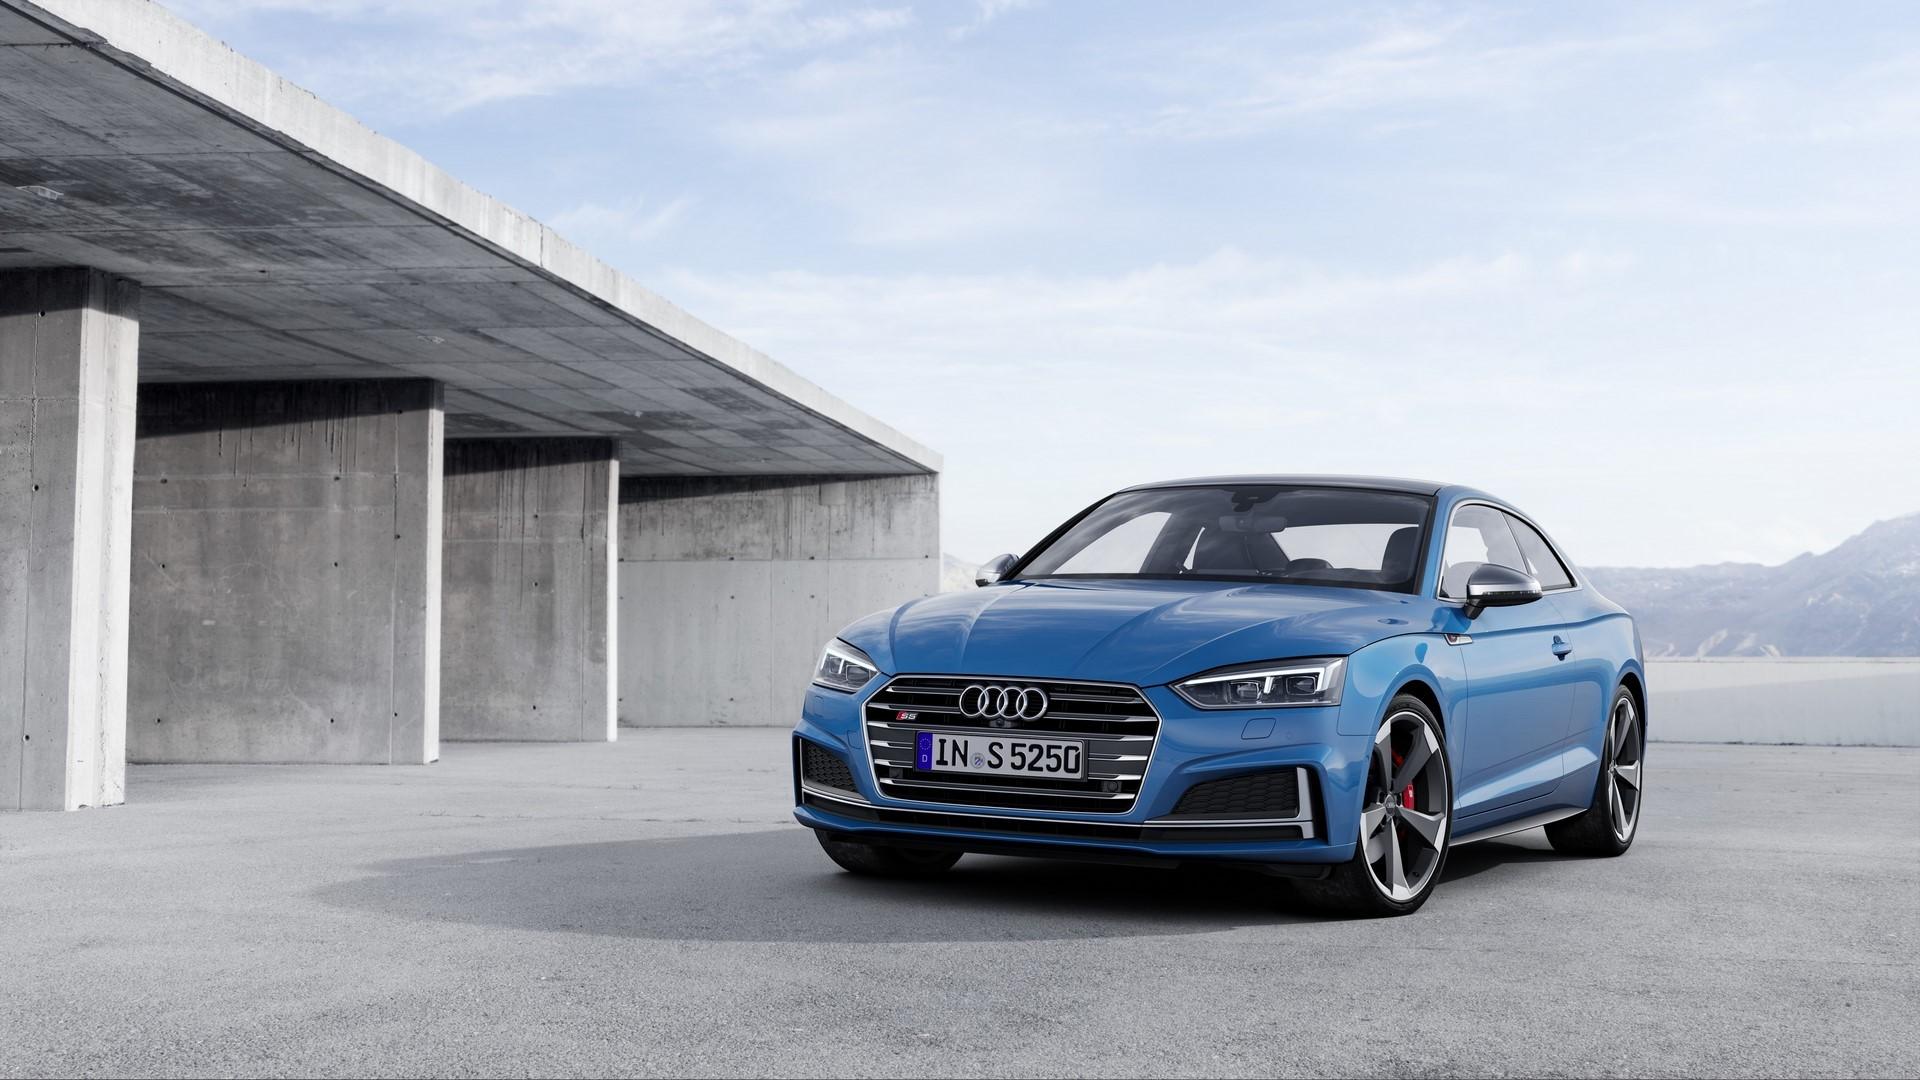 Audi-S5-TDI-Coupe-1